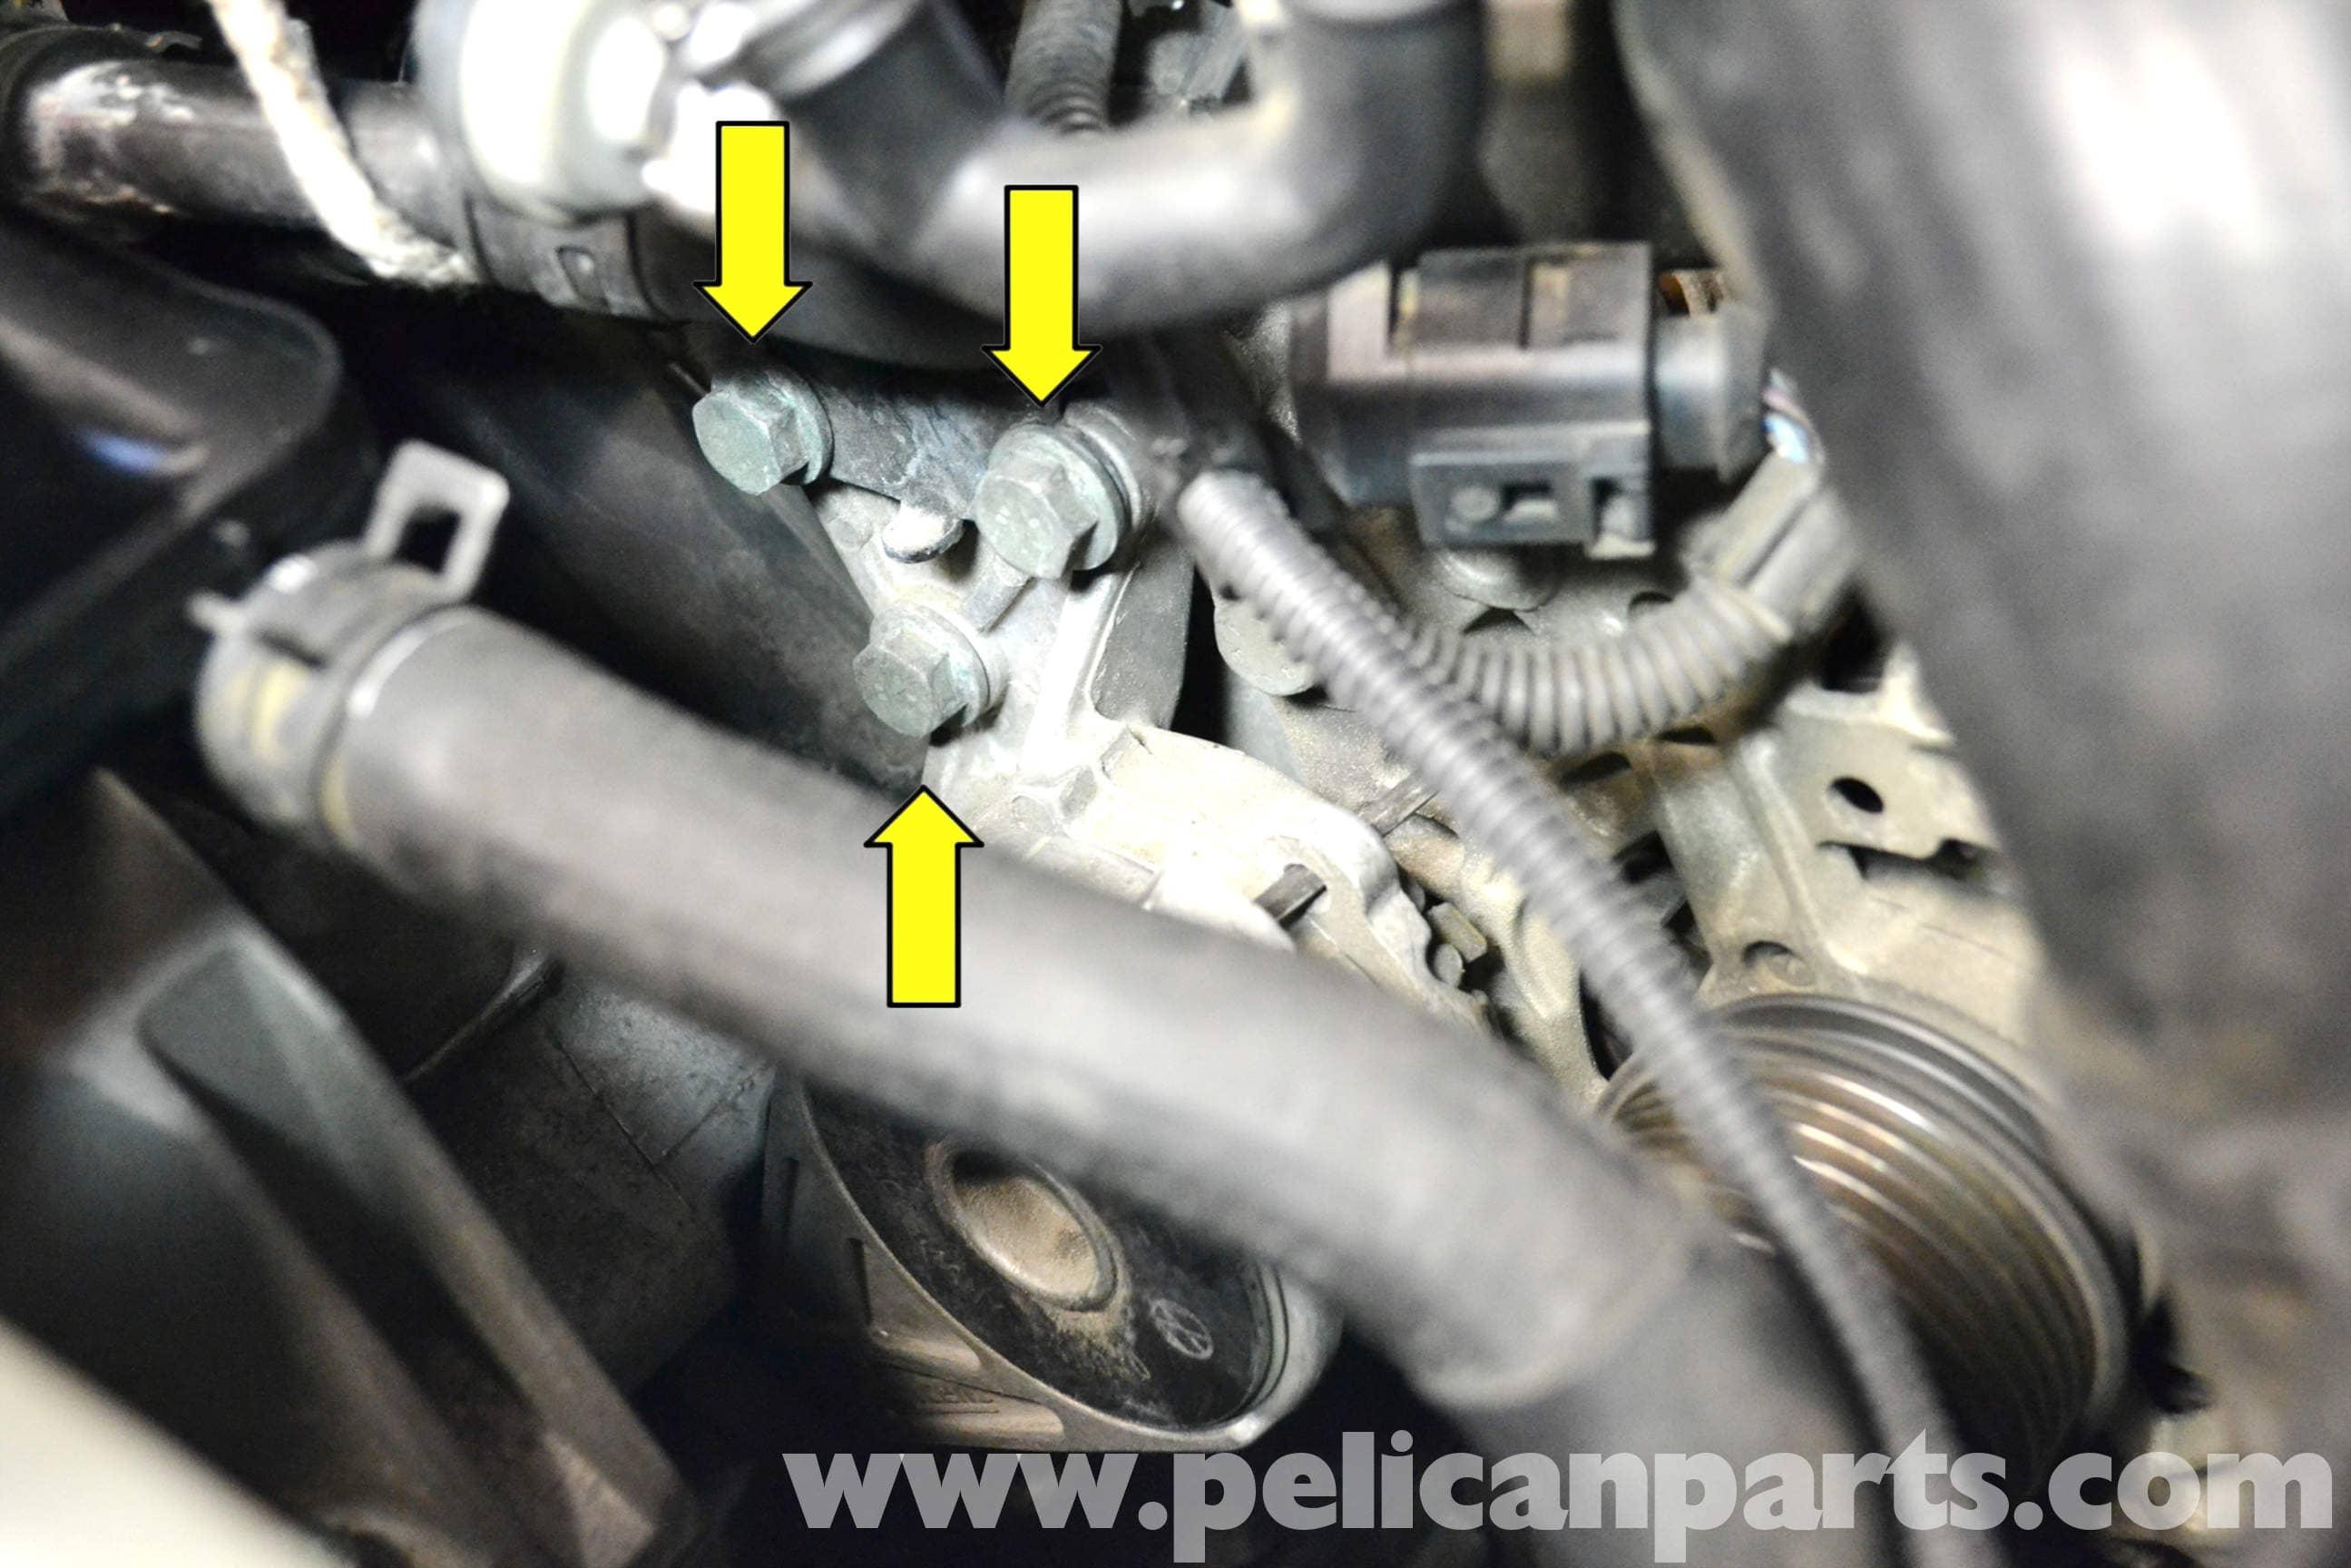 2011 Ford Taurus Wiring Diagram Manual Electrical Schematics Sho Se